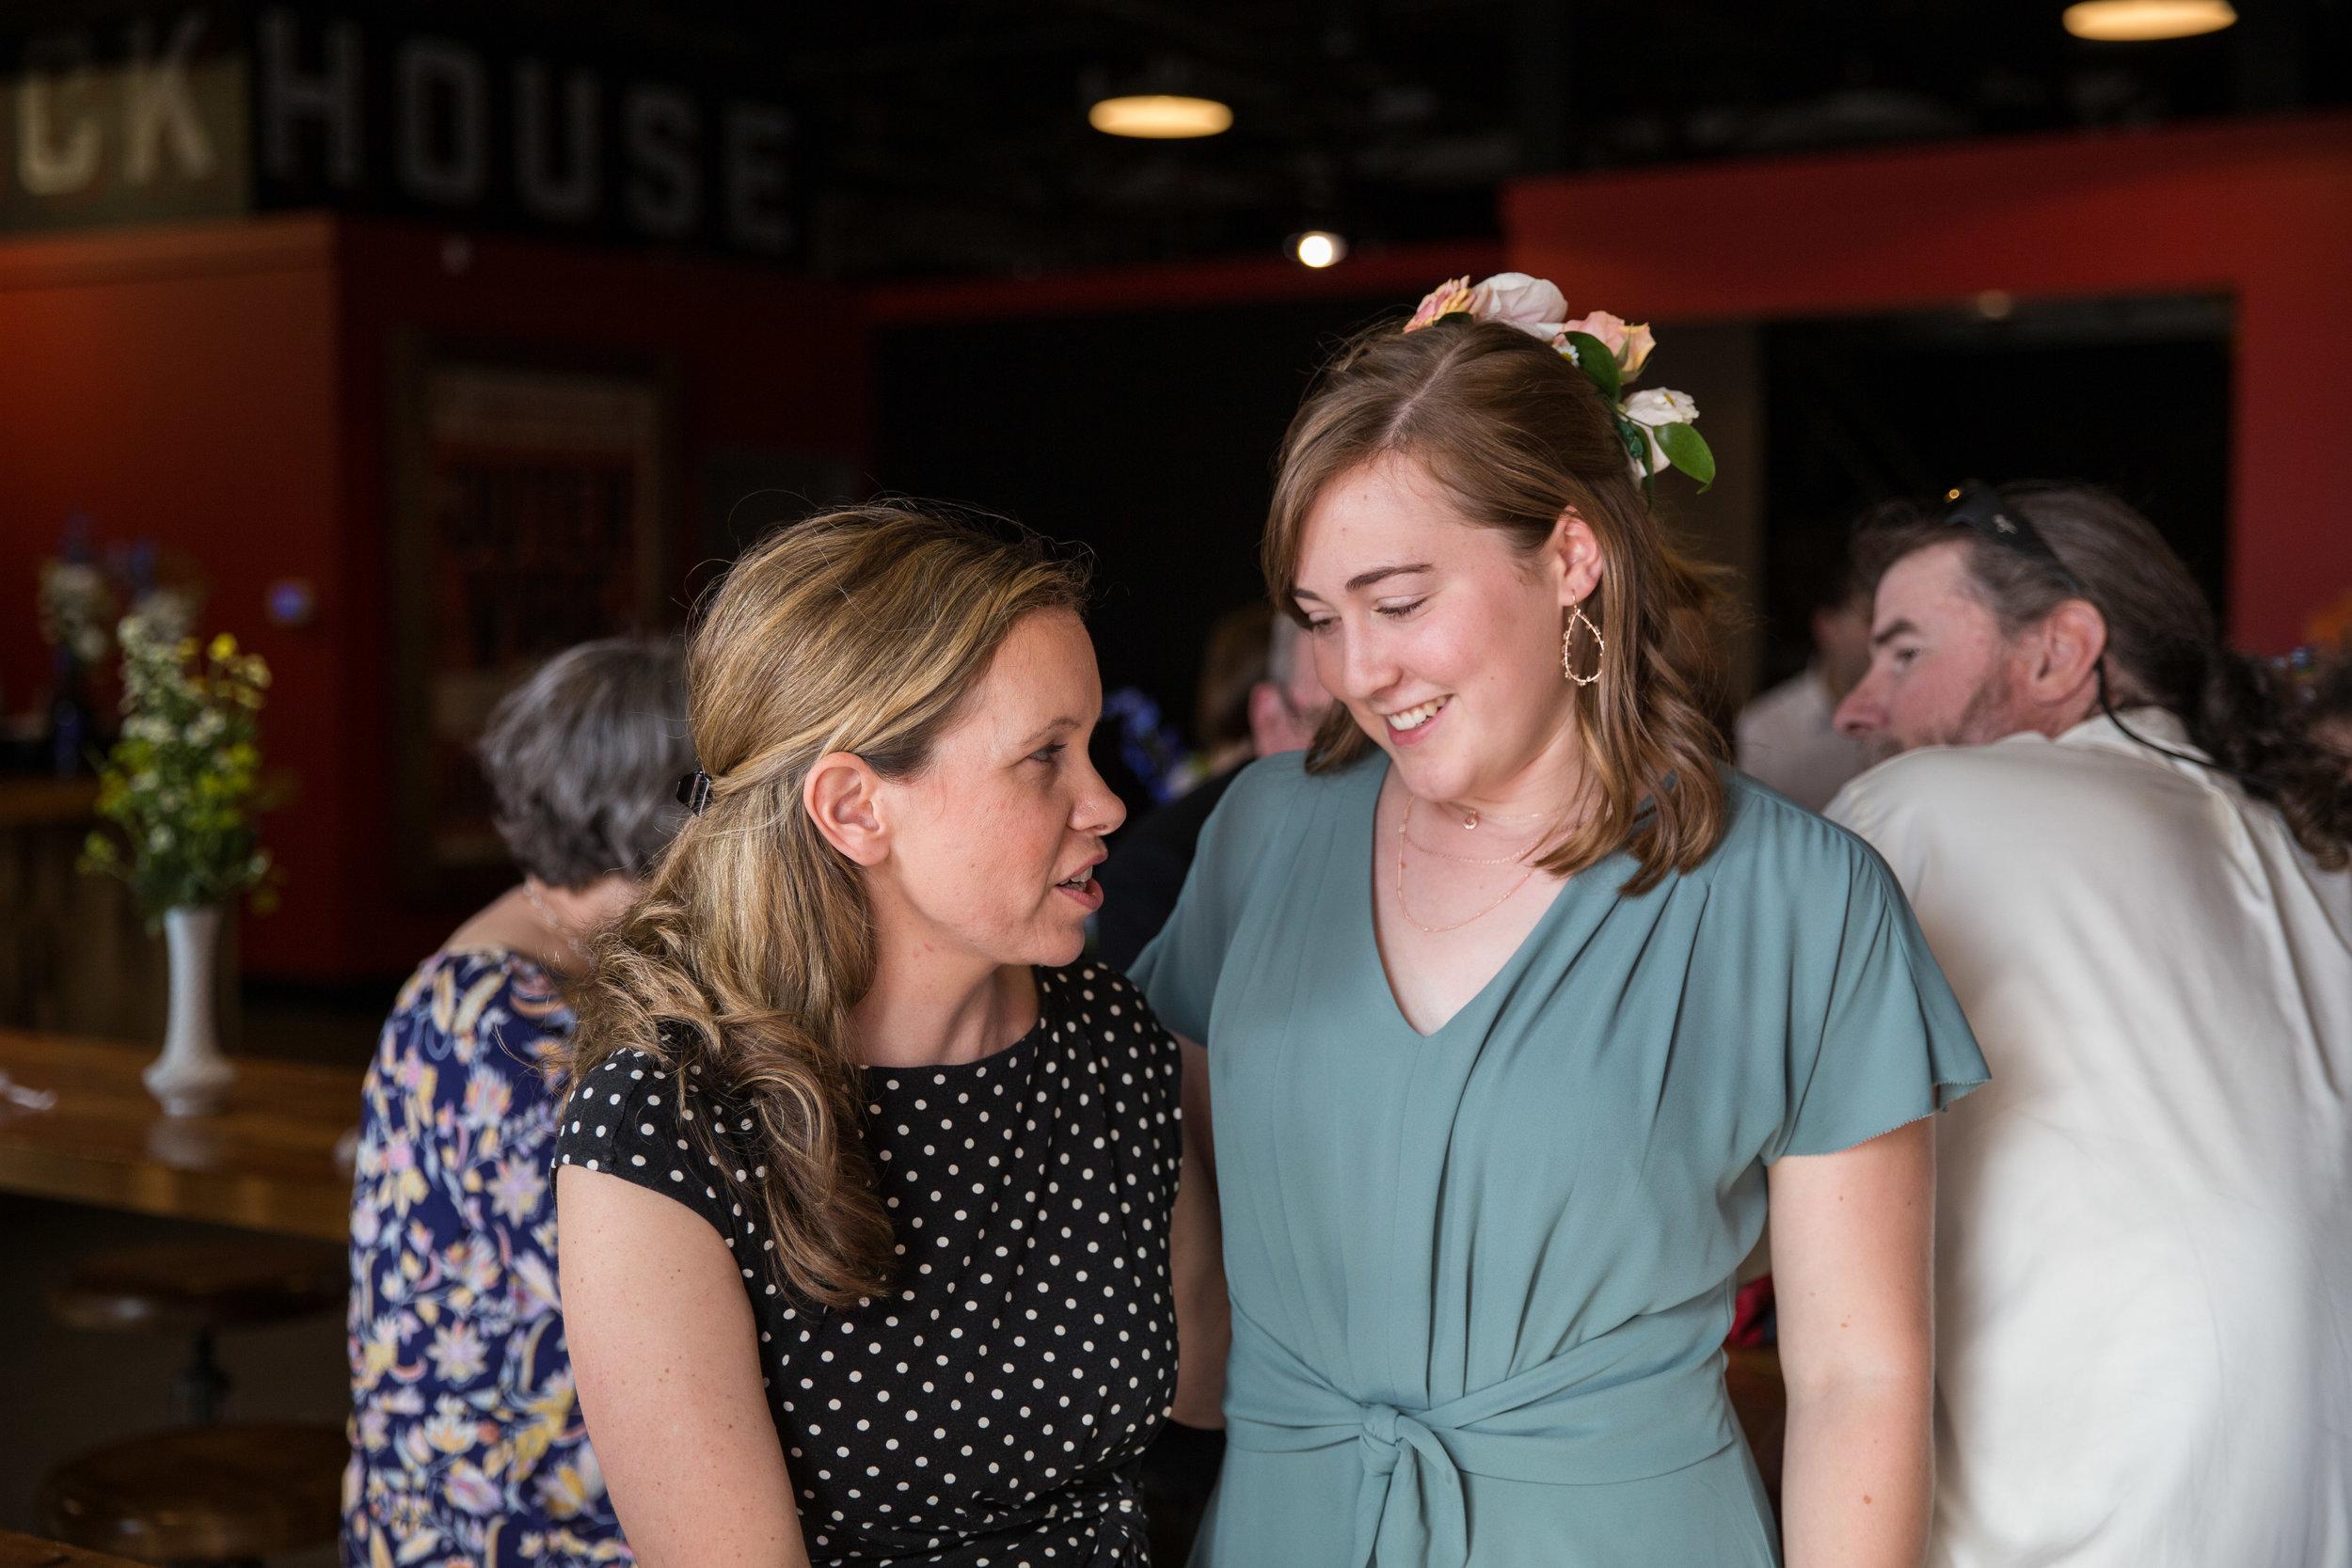 Natalie and Dallas Mooney Wedding 6-8-19_Tania Watt Photography-445.jpg